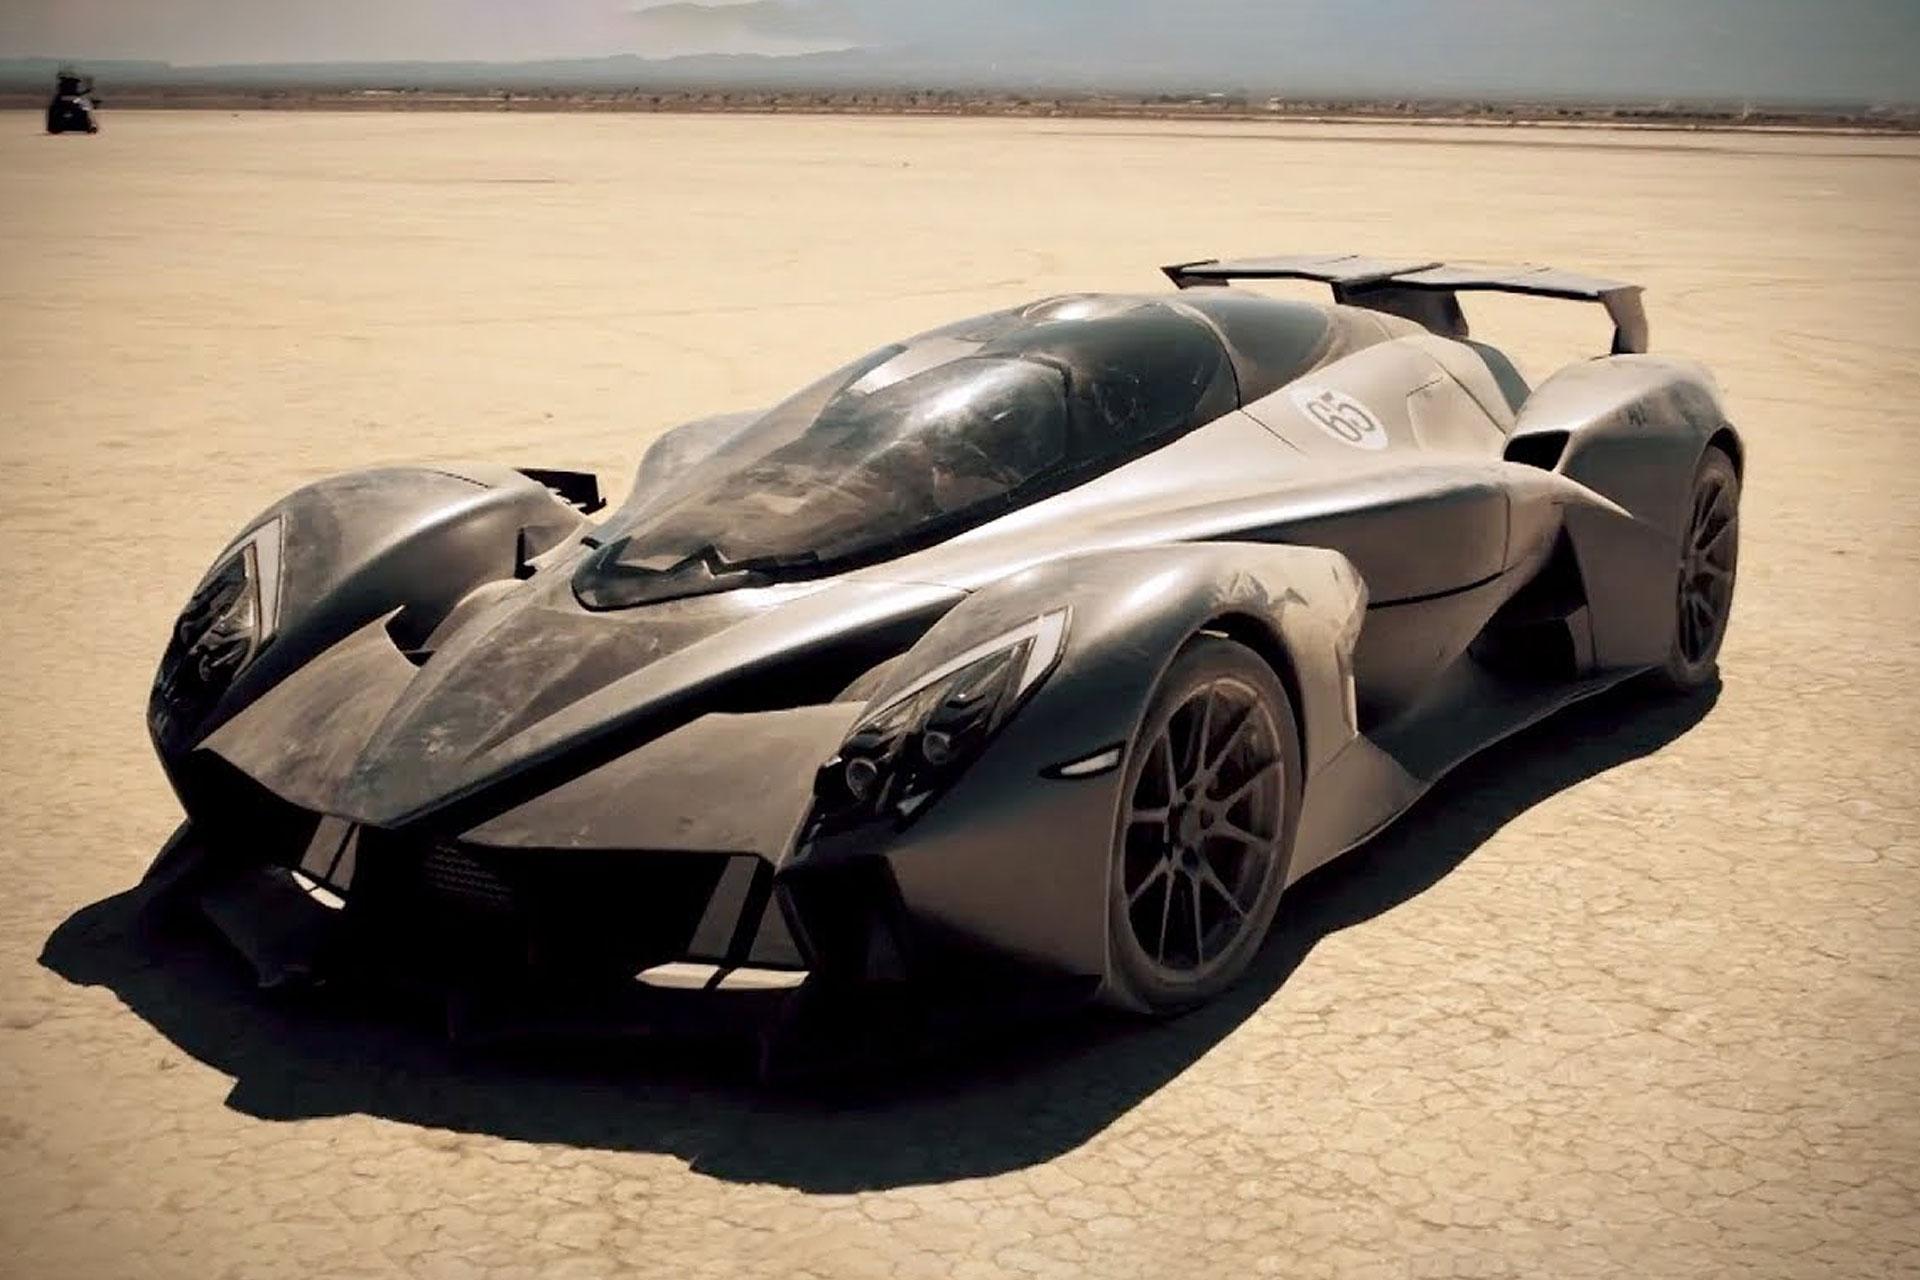 RAESR Tachyon Speed Electric Supercar